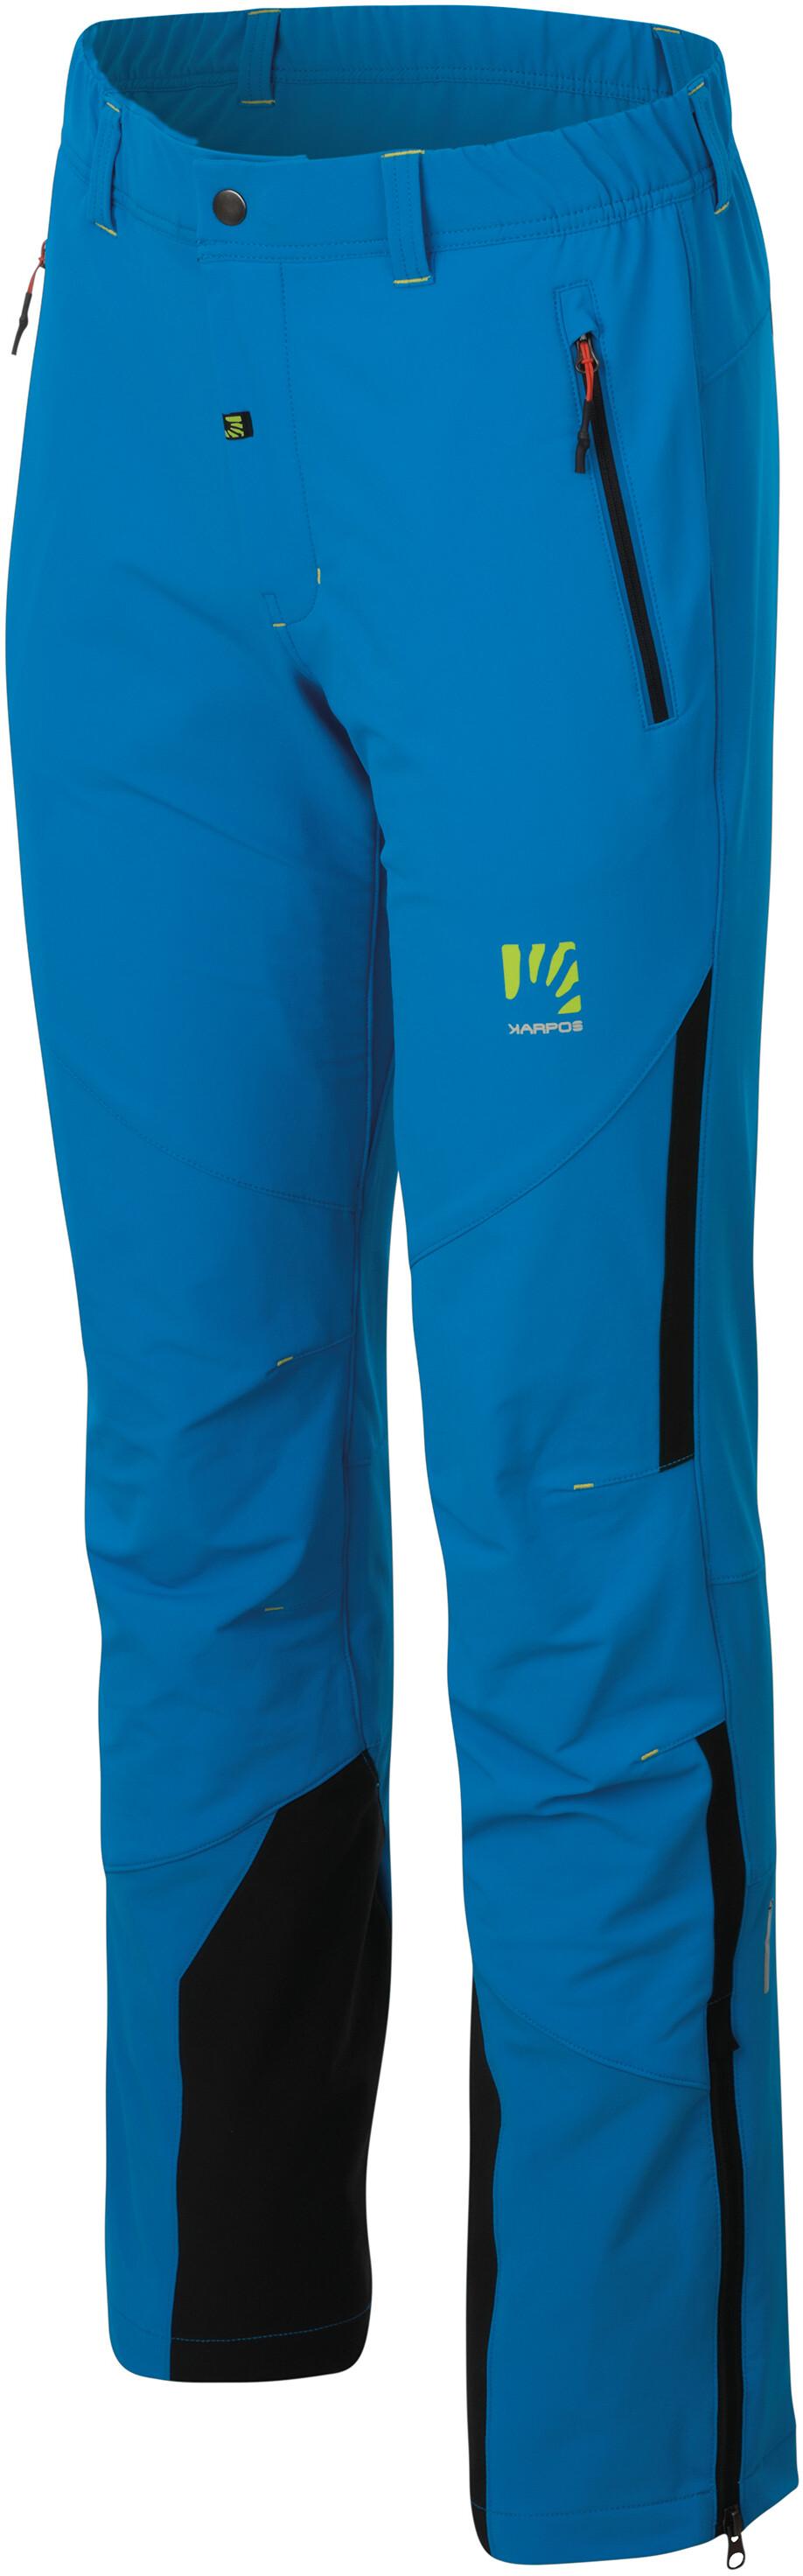 Black//Bluette Karpos Express 200 Evo Pantaloni Uomo